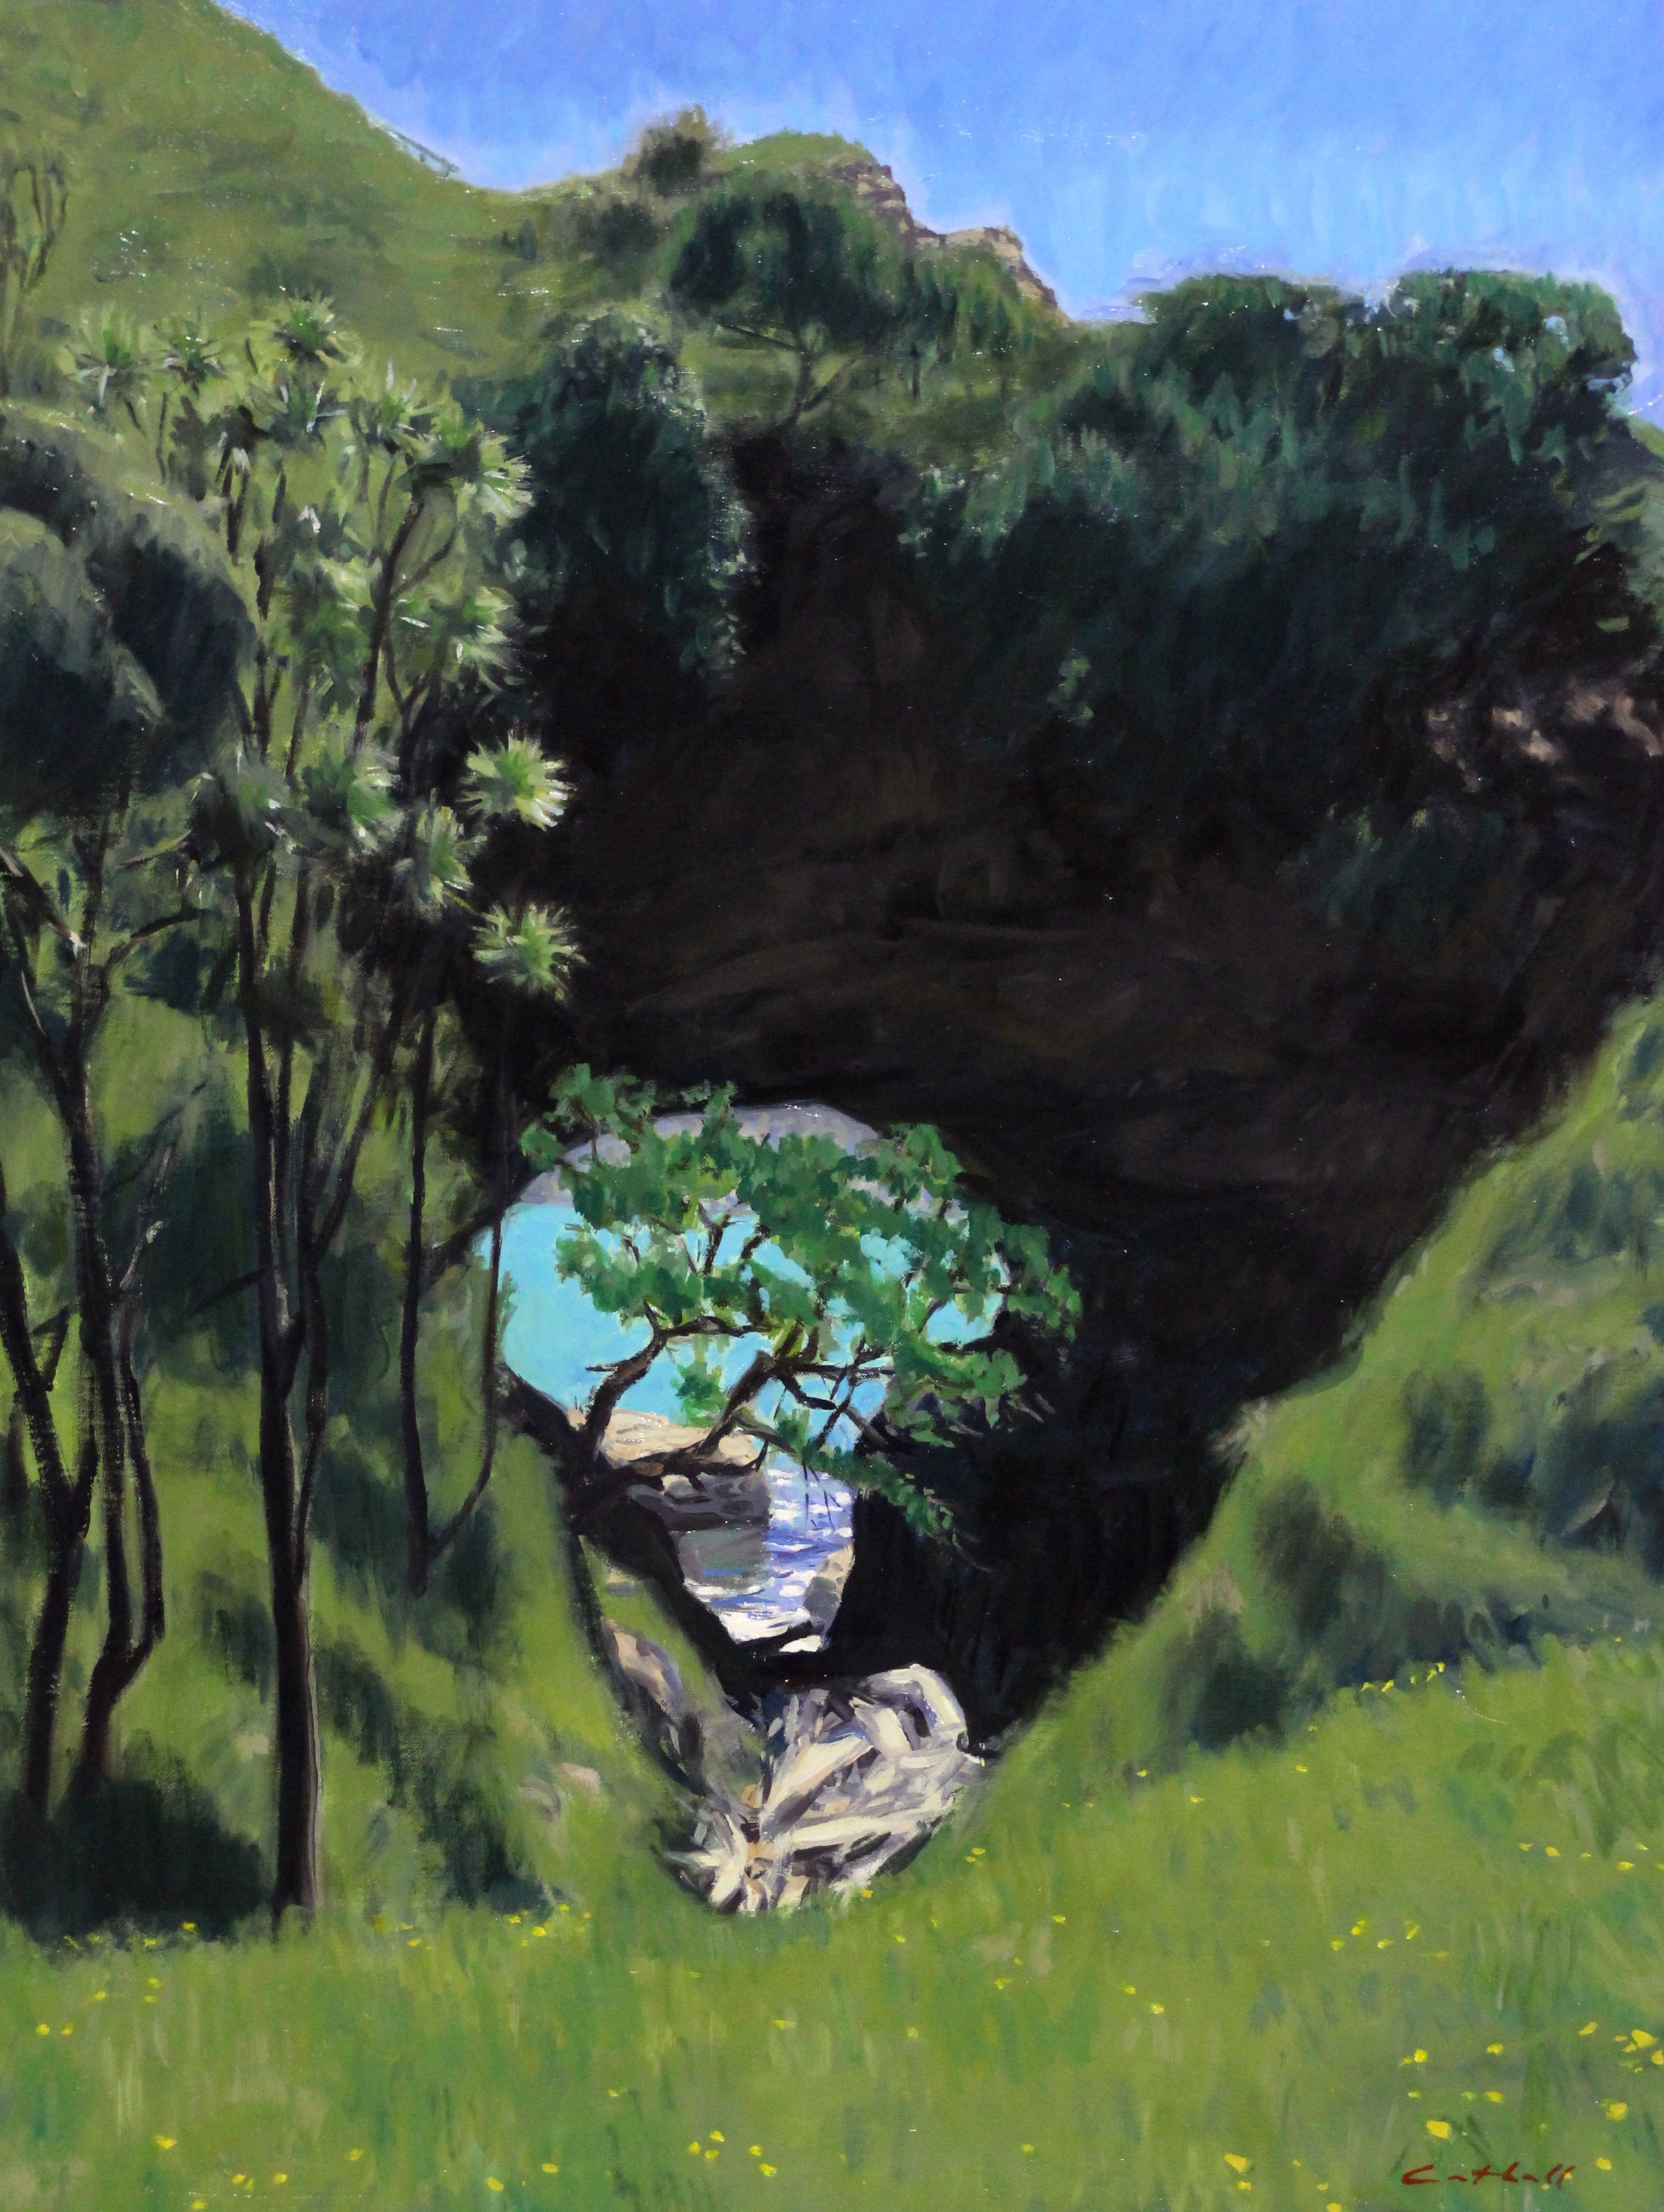 Te Kotere o te Whenua, Oil on Canvas 77 x 58cm, 2017